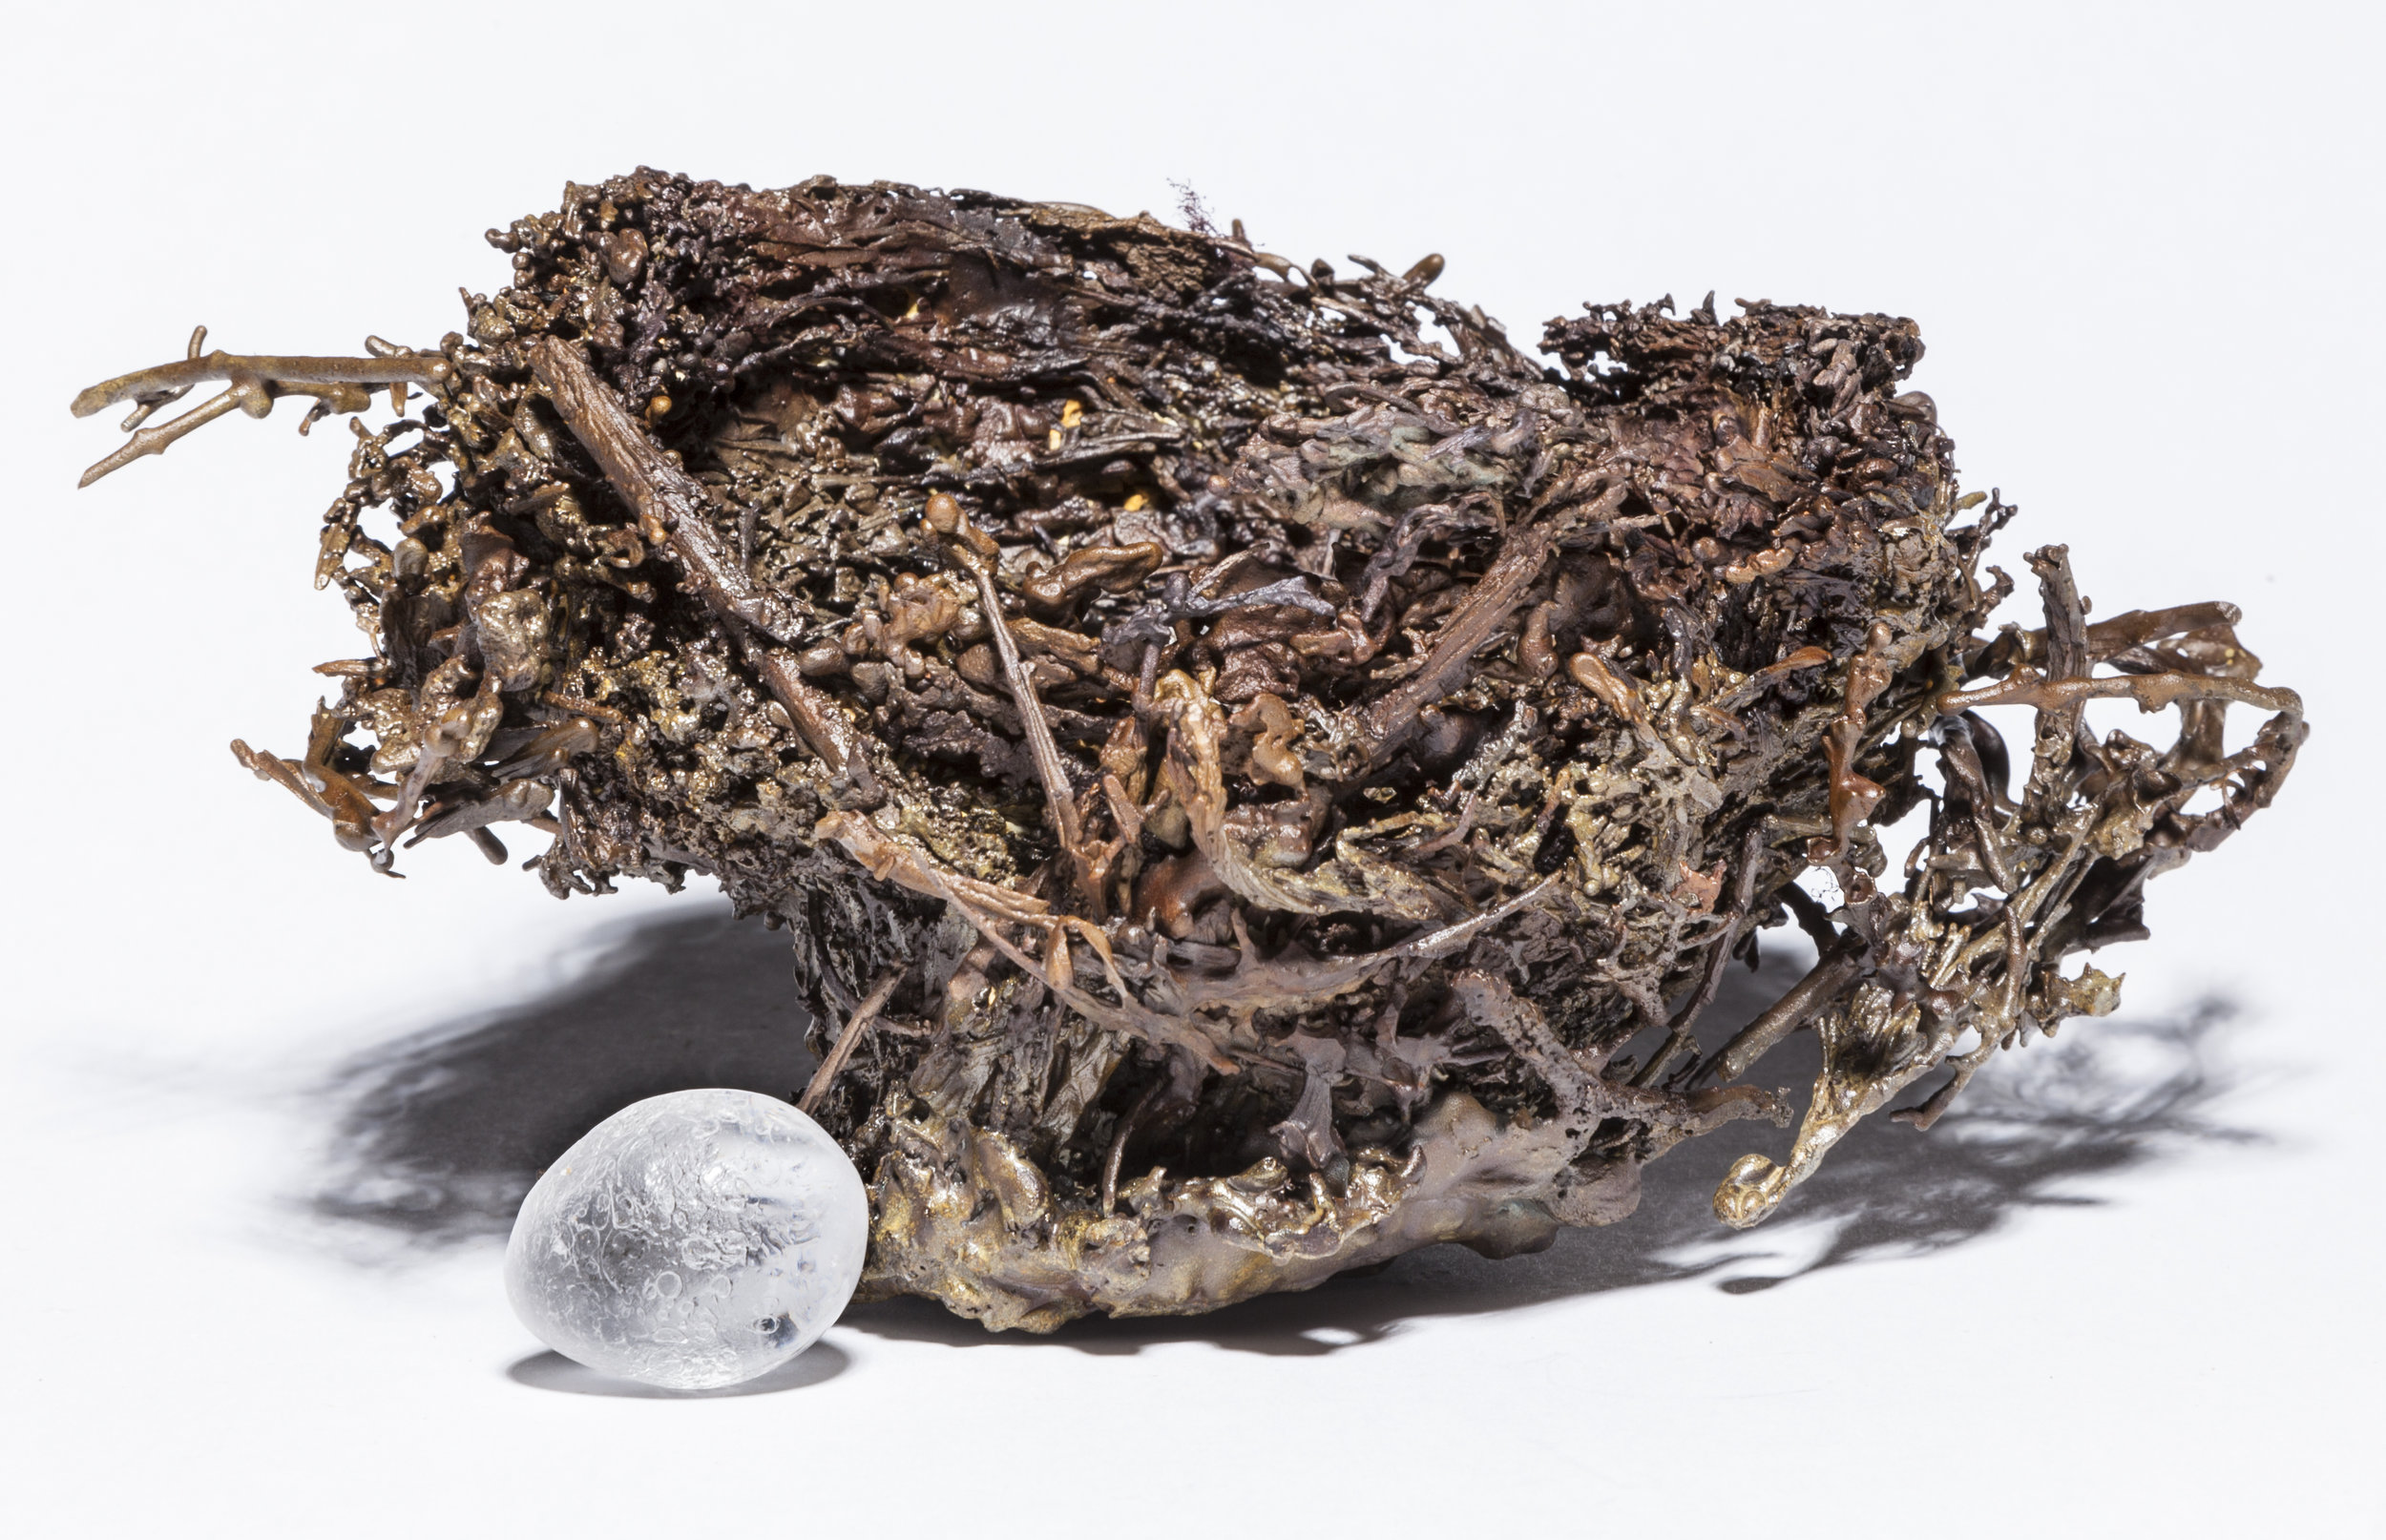 BaleCreekAllen Nests-029.jpg